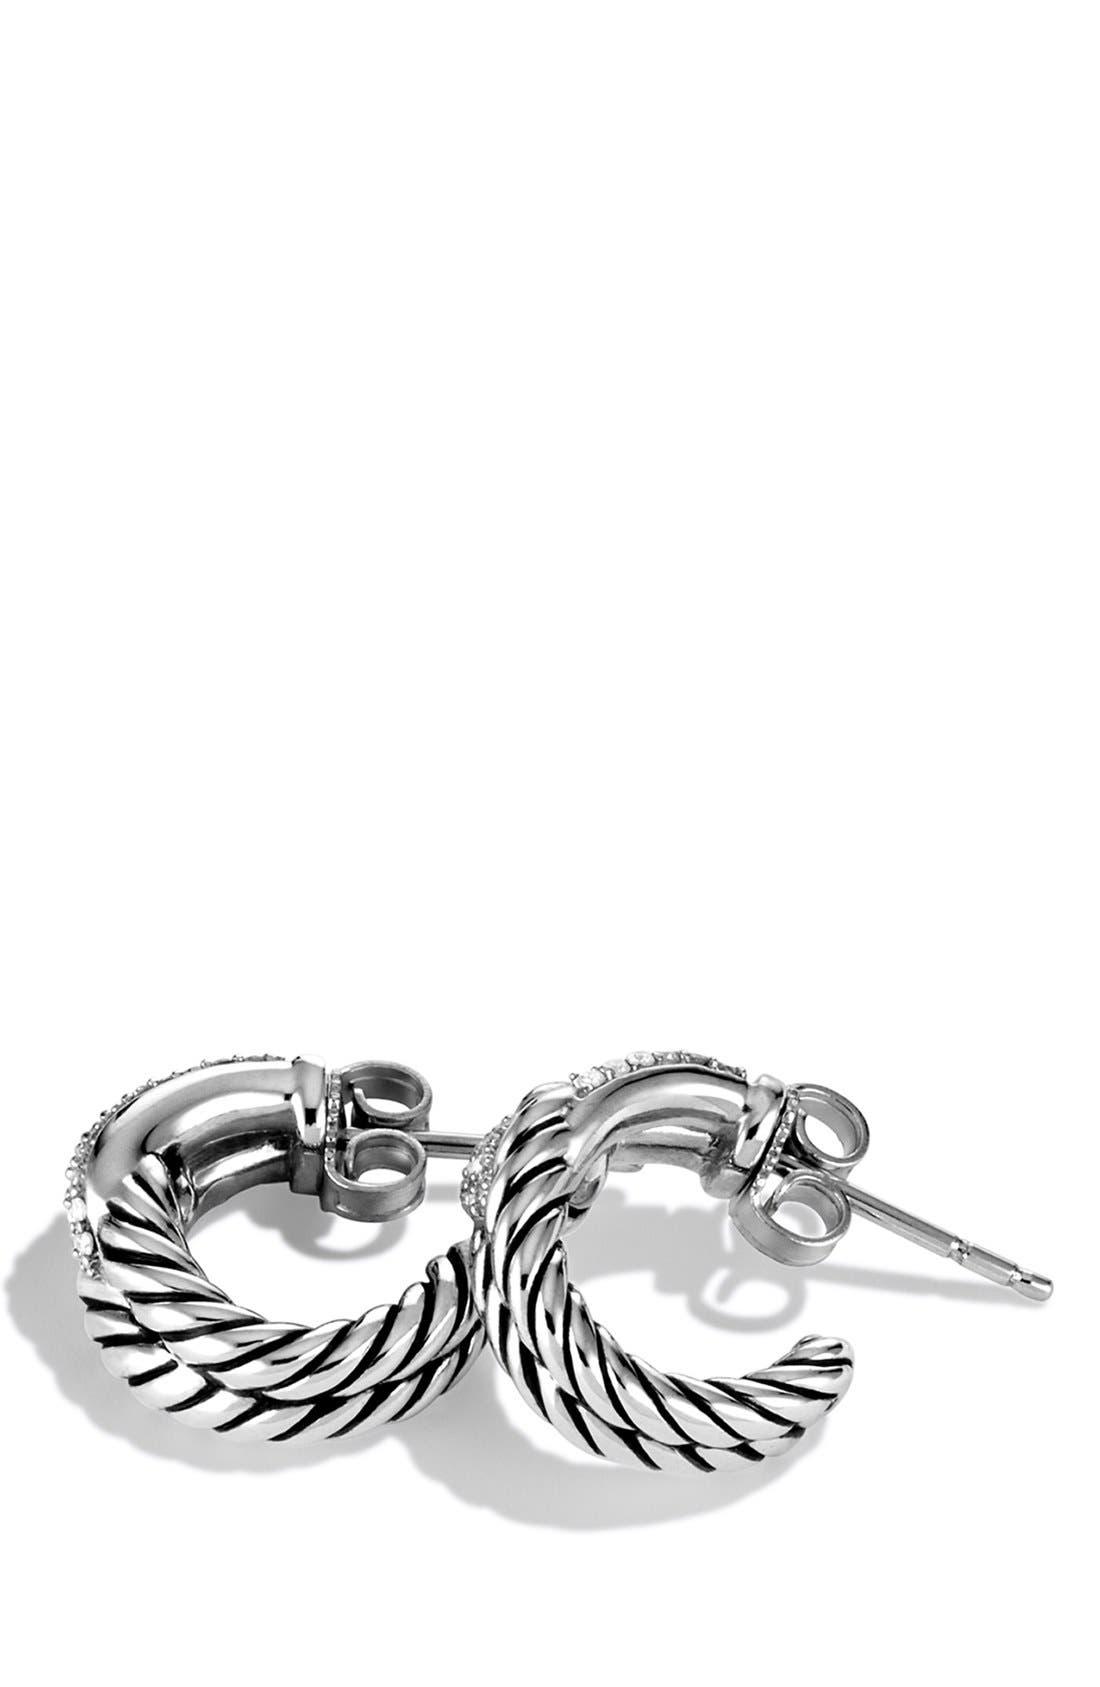 'Labyrinth' Single Loop Earrings with Diamonds,                             Alternate thumbnail 3, color,                             DIAMOND